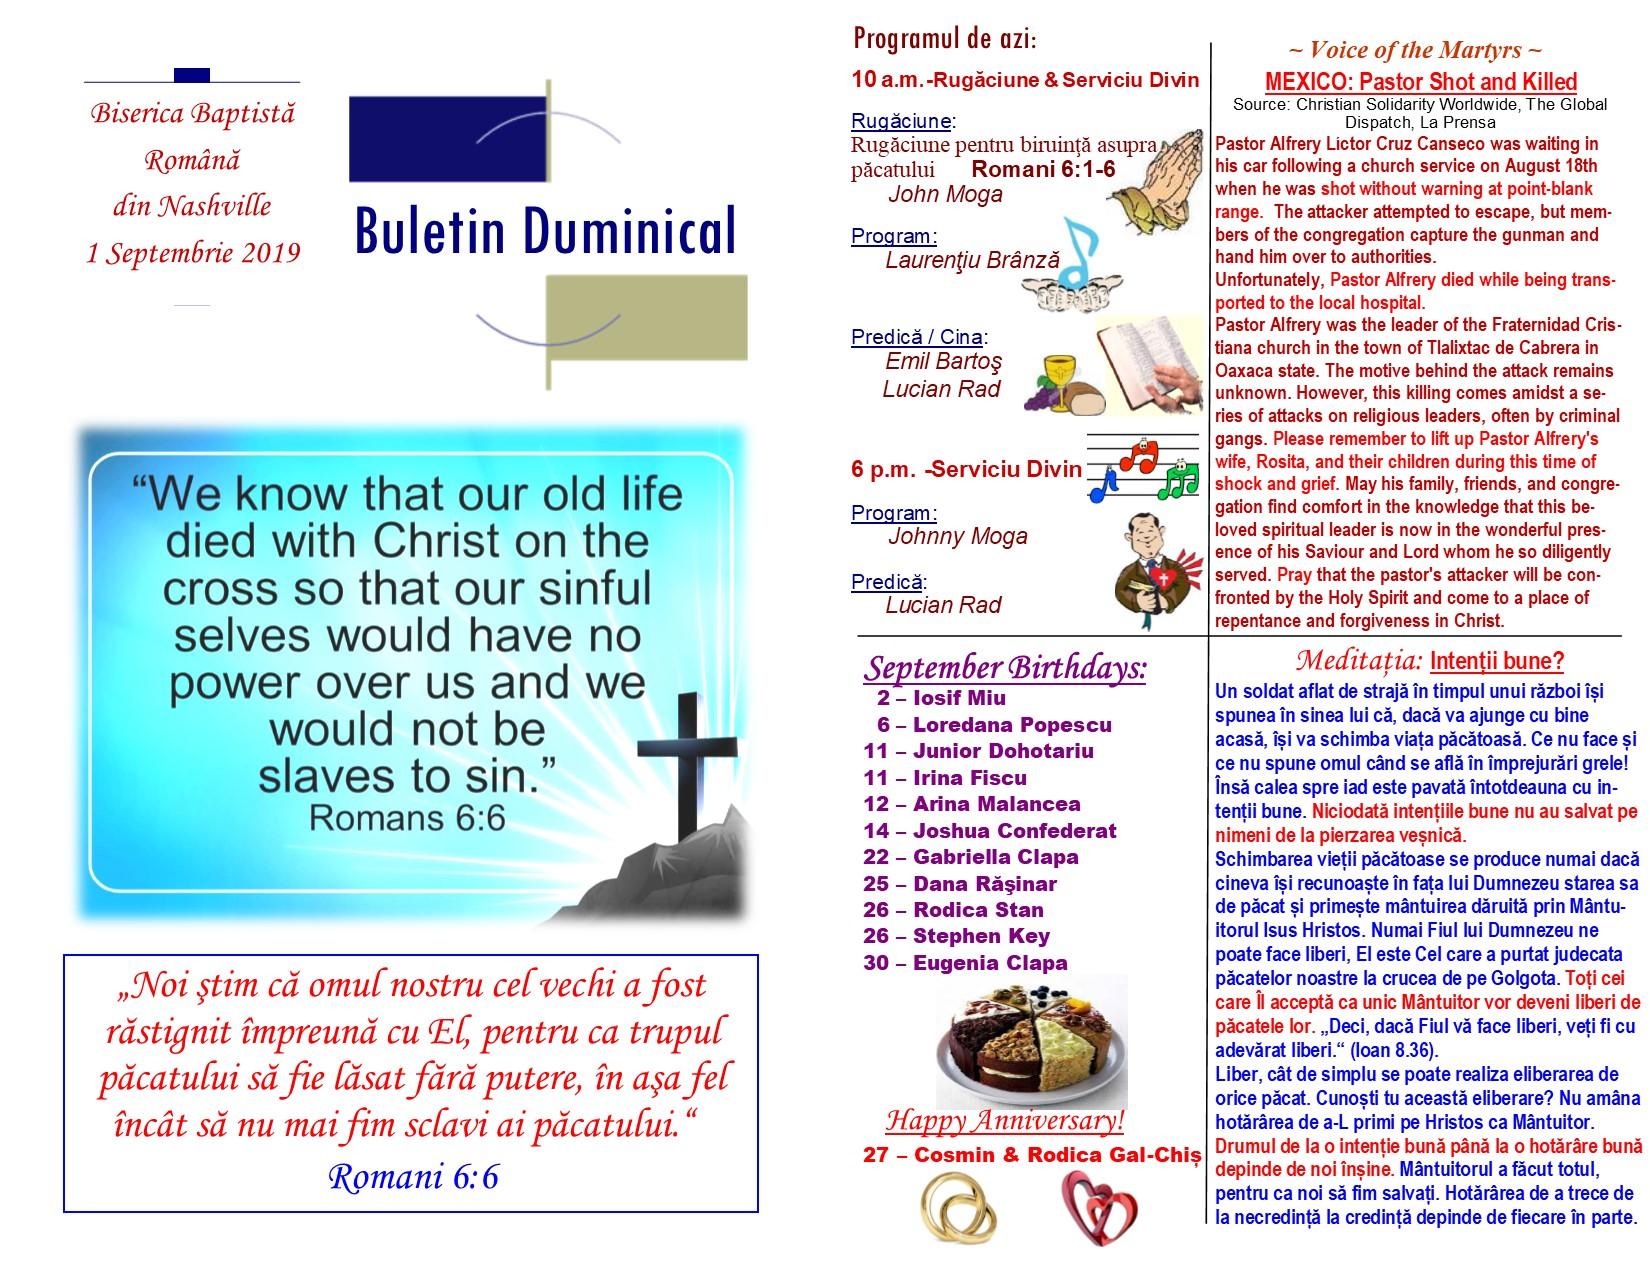 Buletin 09-01-19 page 1 & 2